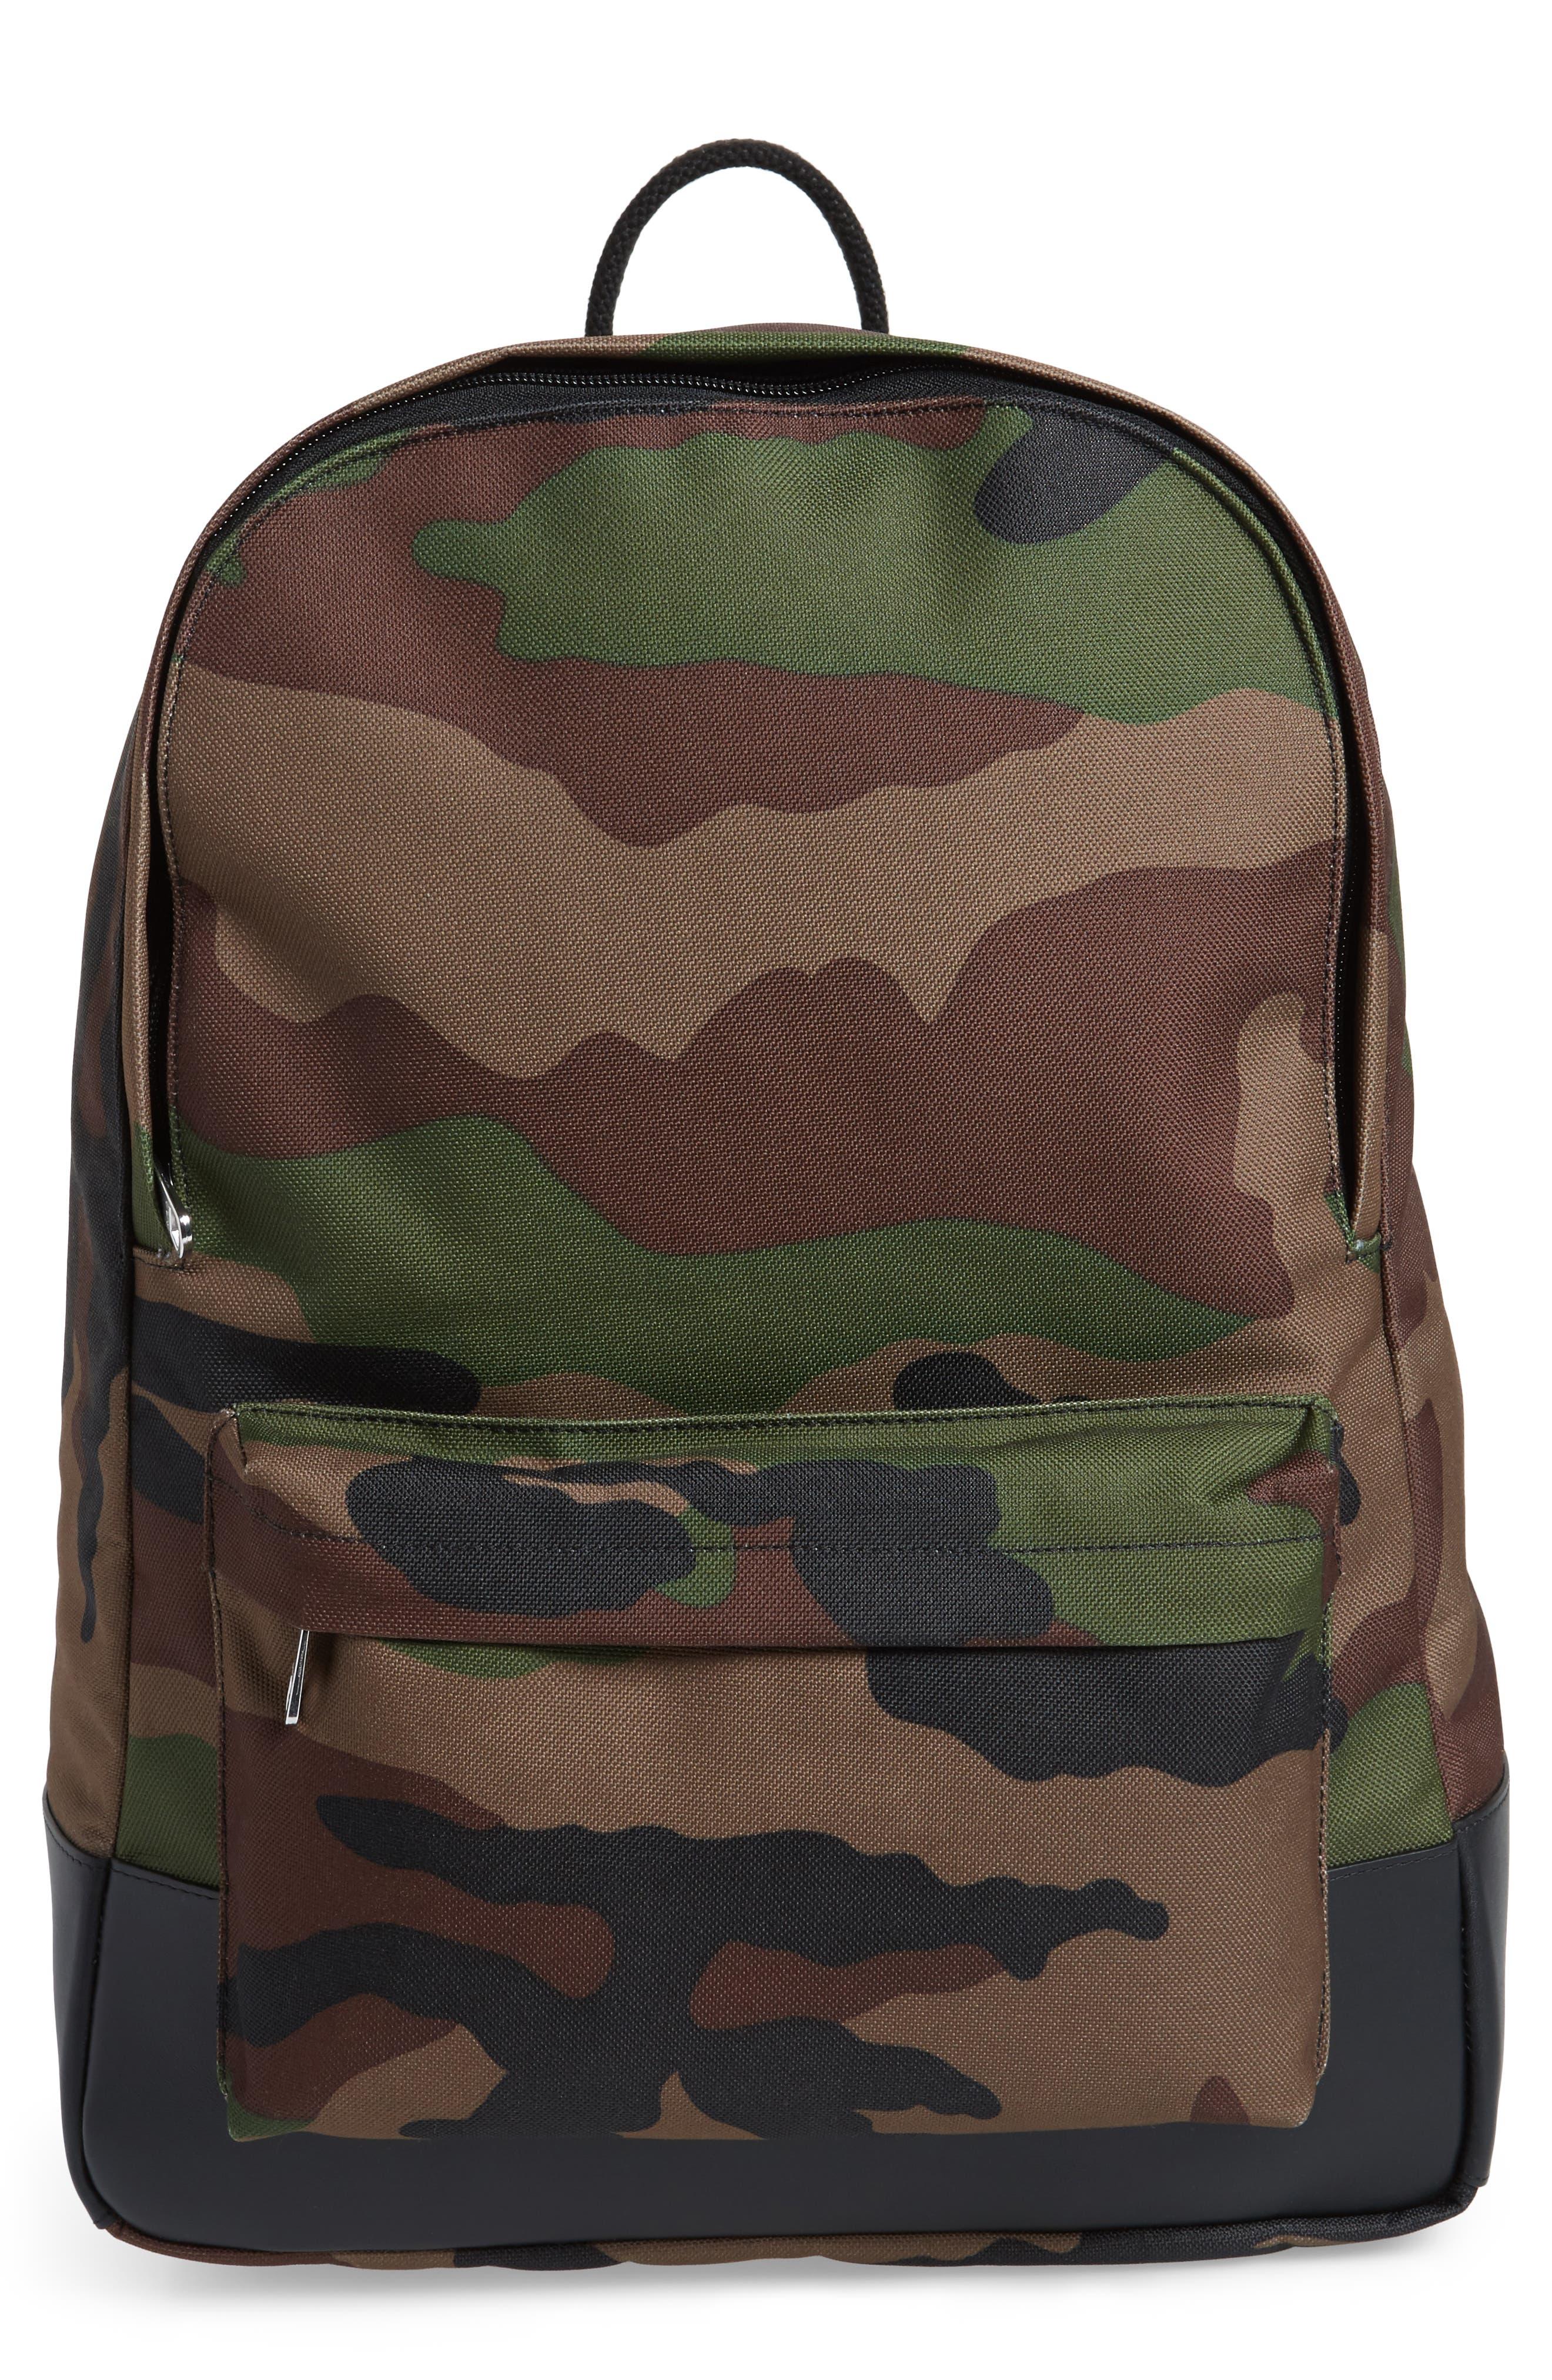 Mickael Camo Print Backpack,                             Main thumbnail 1, color,                             Kaki Militaire Jac